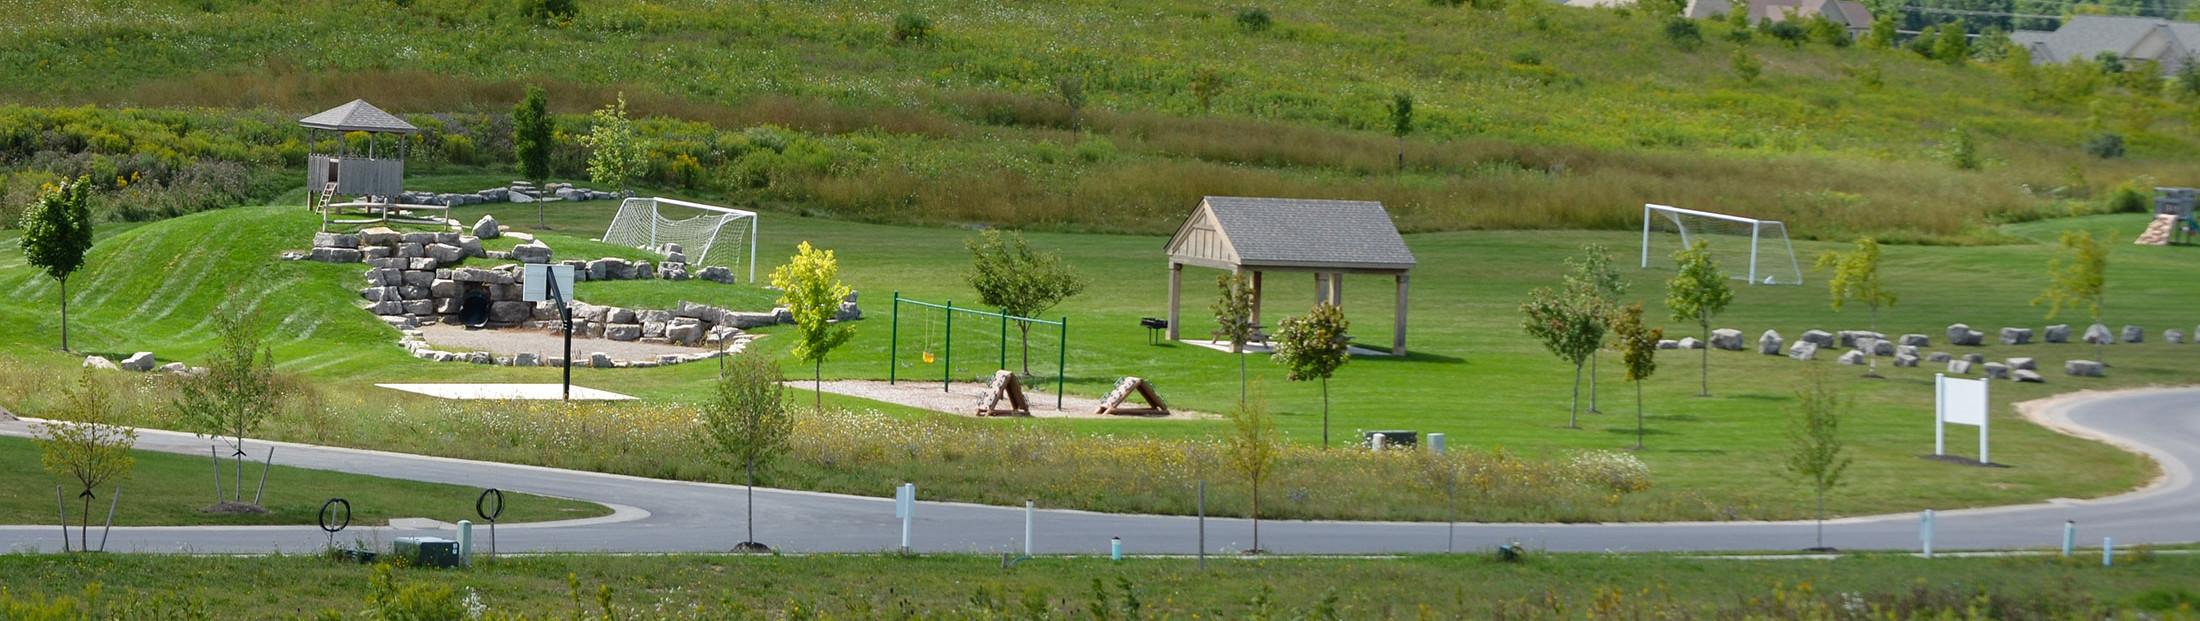 Lakewood Meadows Community Park